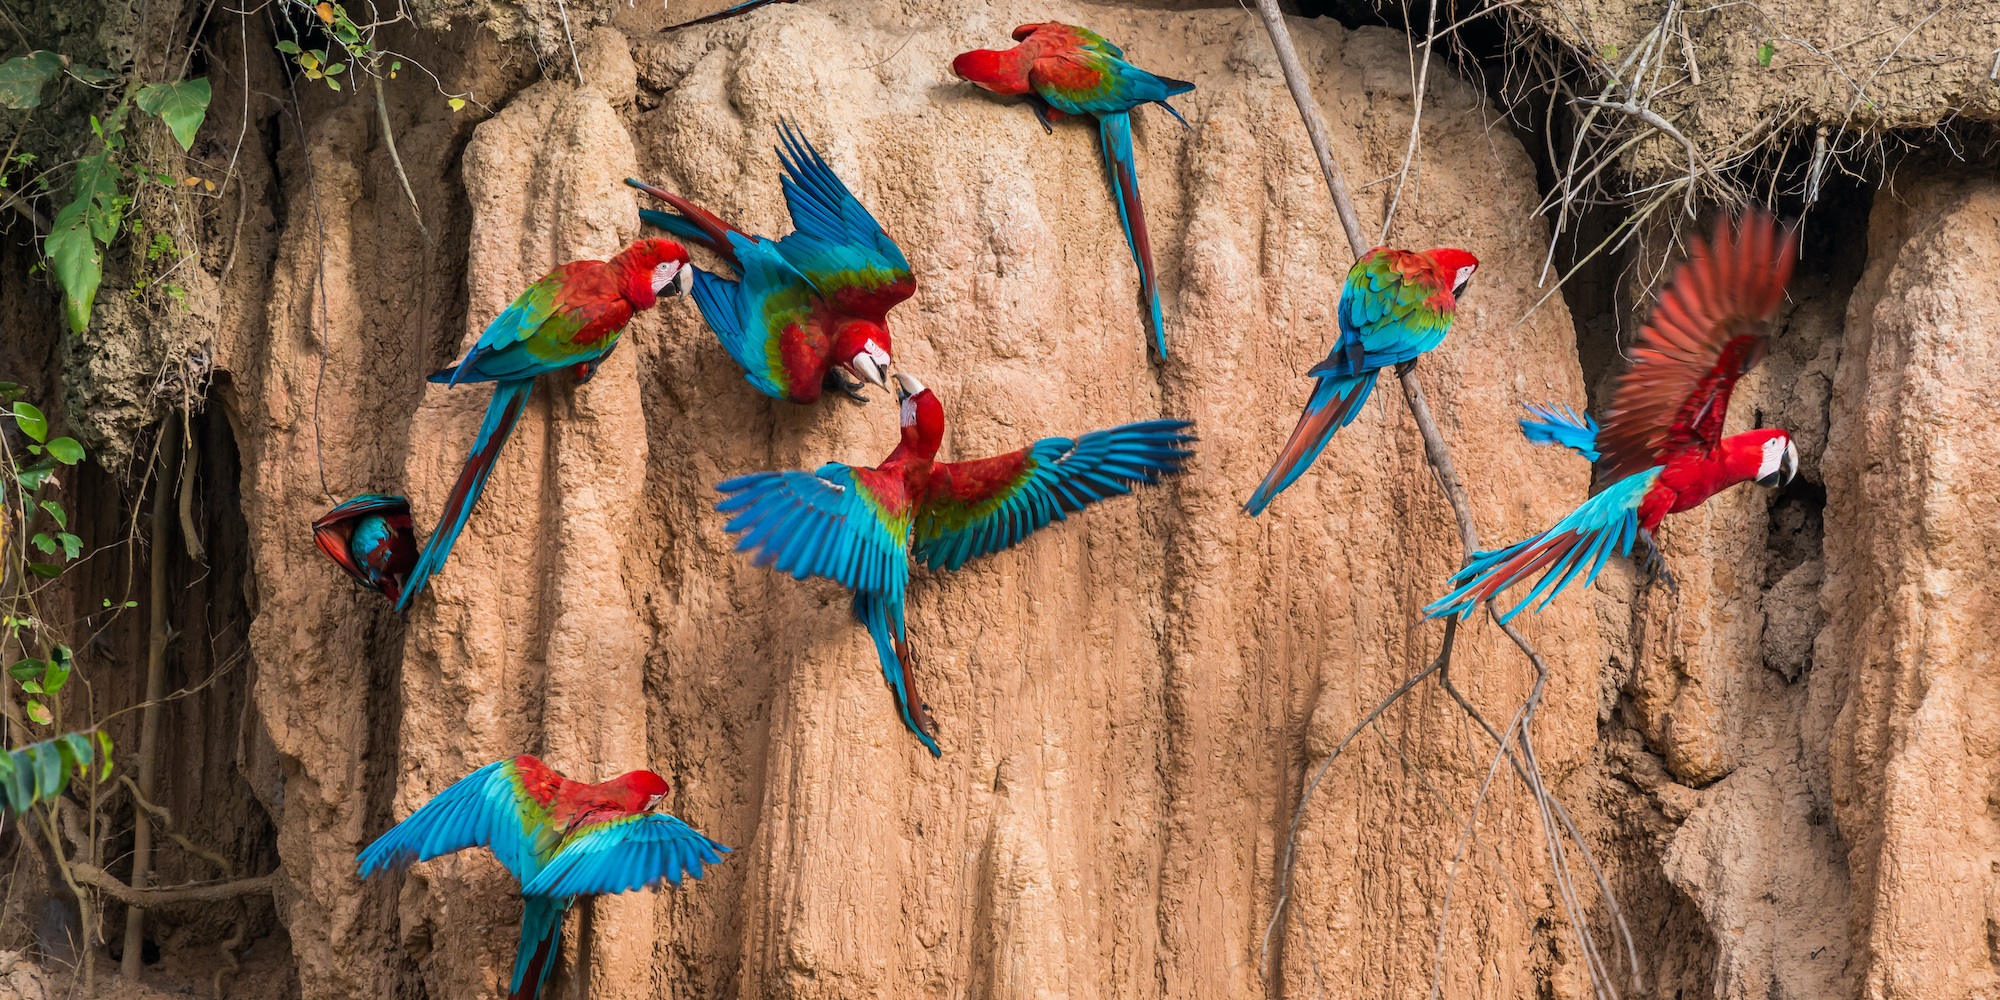 Peru travel guide: Amazon Jungle wildlife parrot